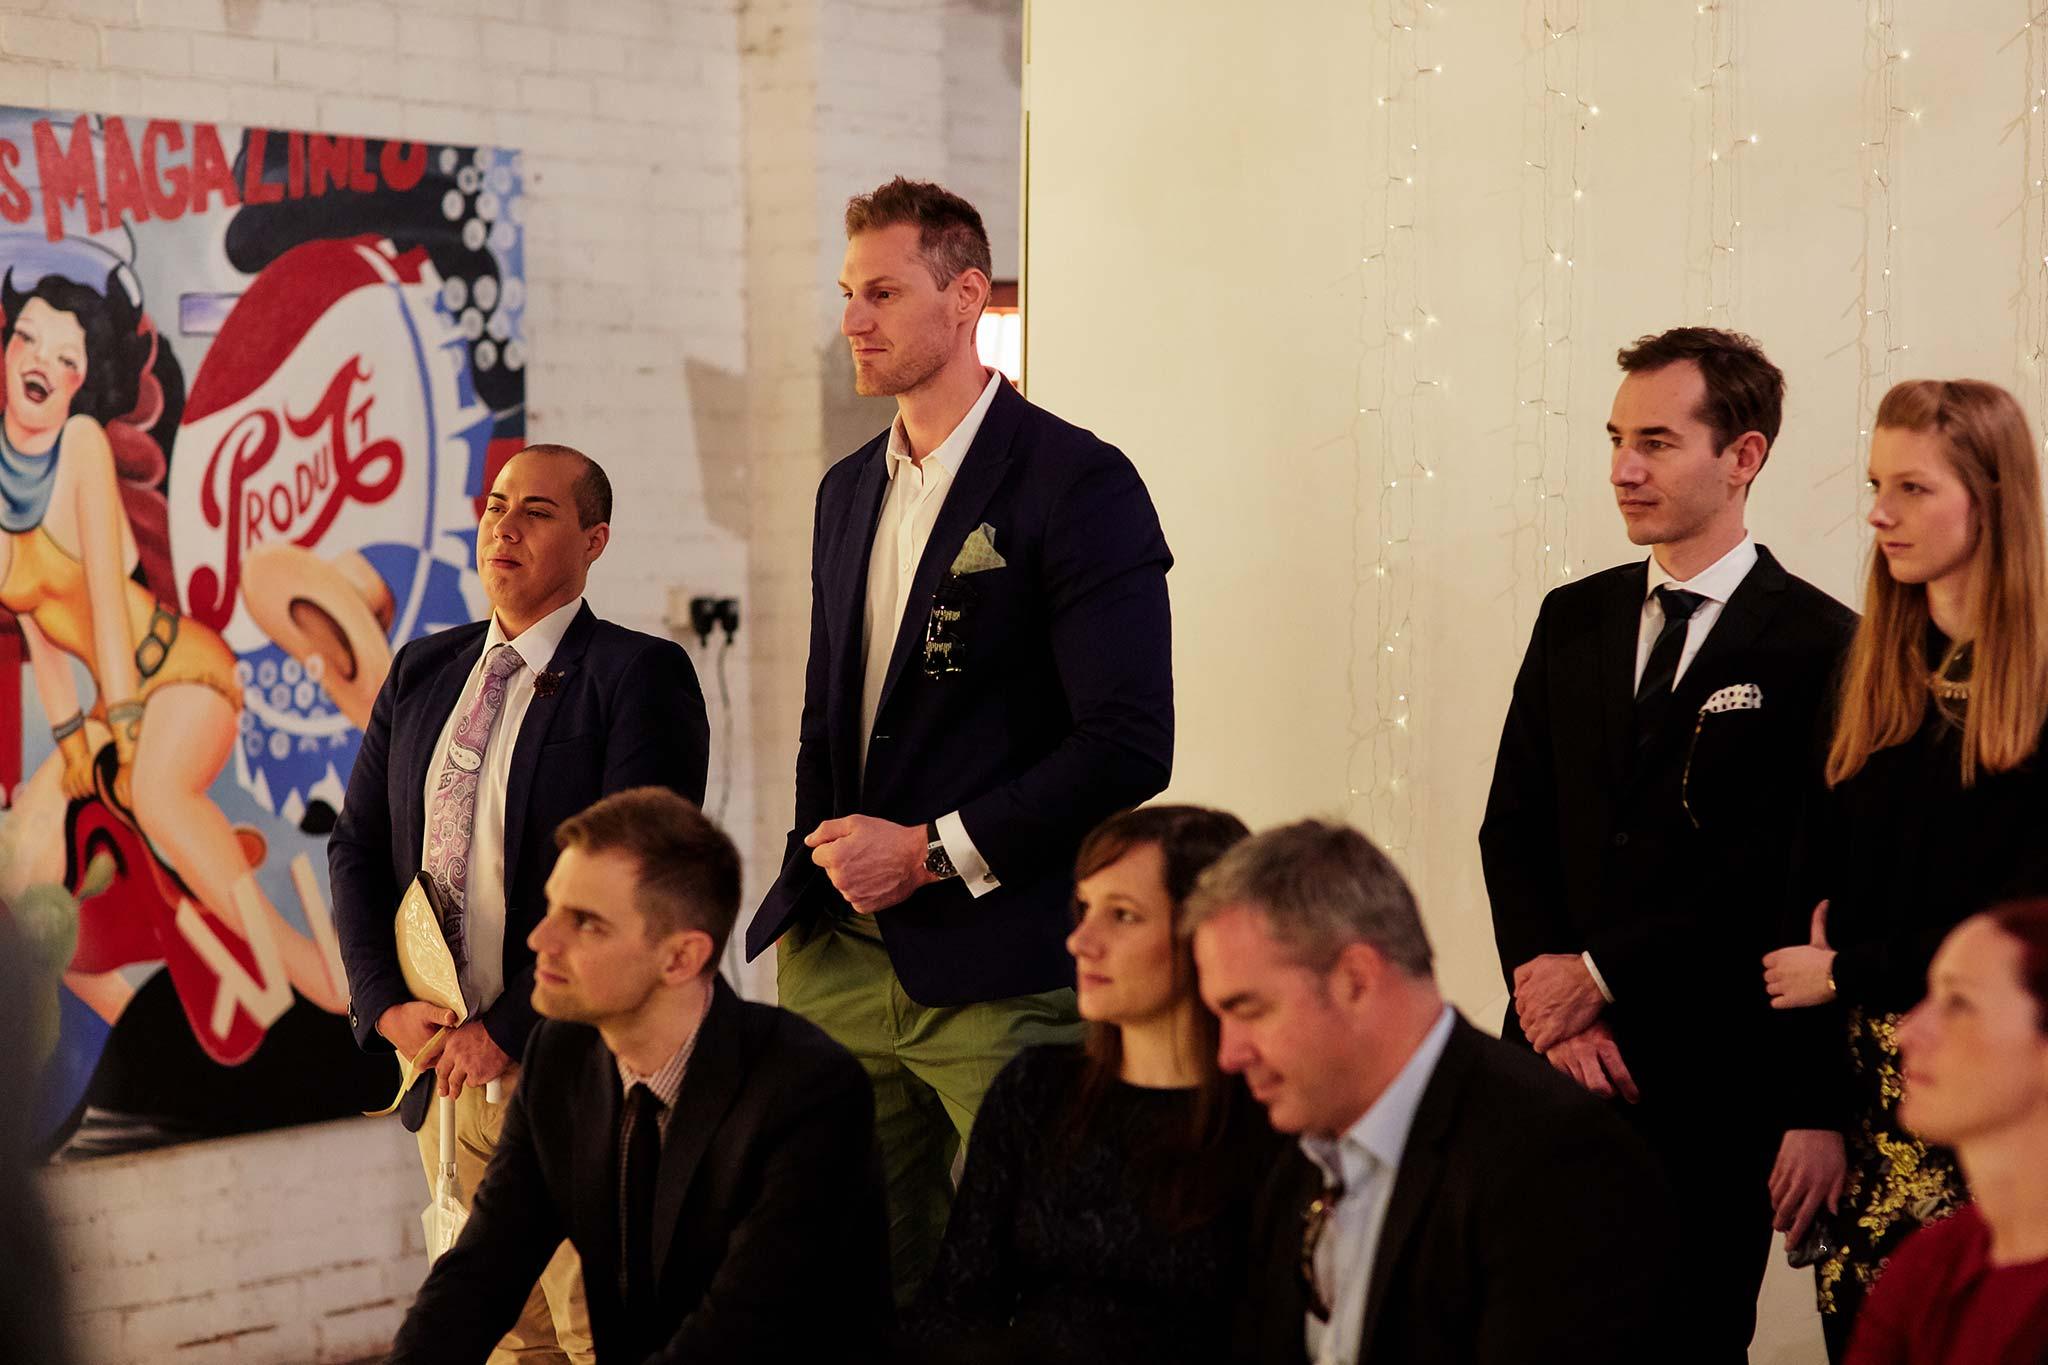 Melbourne-Wedding-Photographer-smartartz-gallery-ceremony